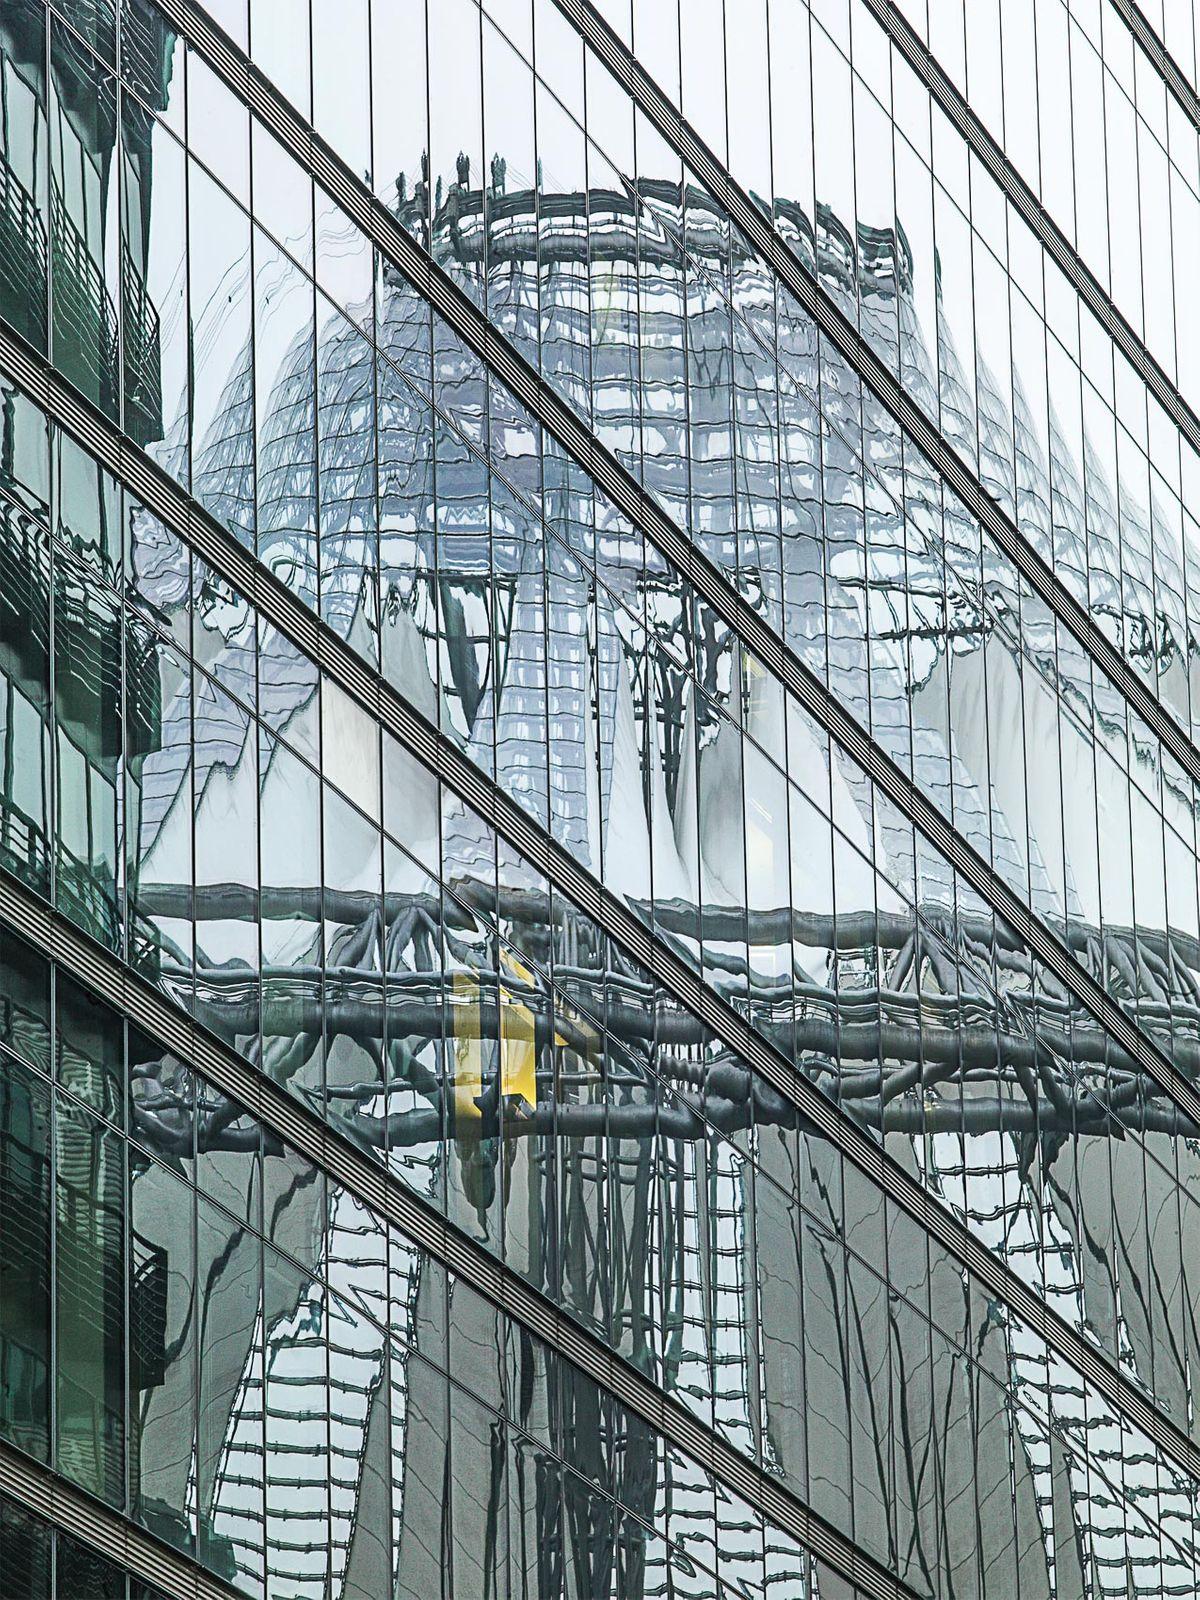 THE GHERKIN, COMMERCIAL SKYSCRAPER, LONDON, ENGLAND, 2018